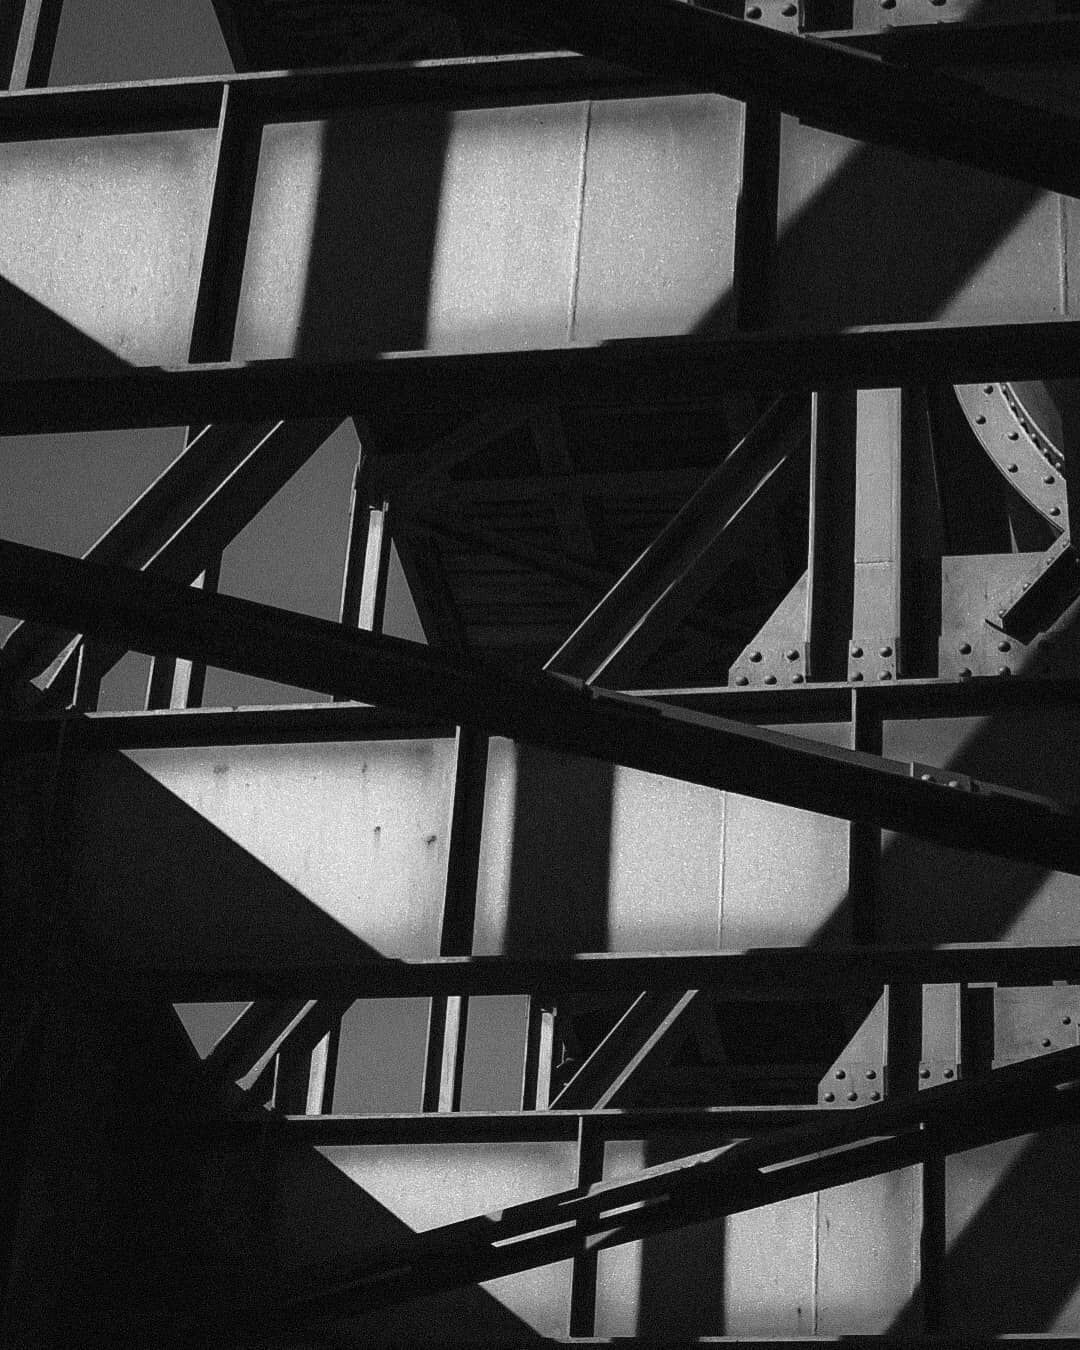 B/W contrasts.  #bw #blackandwhite #blackandwhitephotography #contrast #contrasts #photoediting #lightroom #lightroomedits #lightroompresets #bridge #streetphotography #streetsineurope #streetclassics #walkingshot #streetphotographyinternational #aboutstreetphotography #timeless_streets #creativity #creativephotography #photoart #photographyart #photoprint #printsforsale #prints